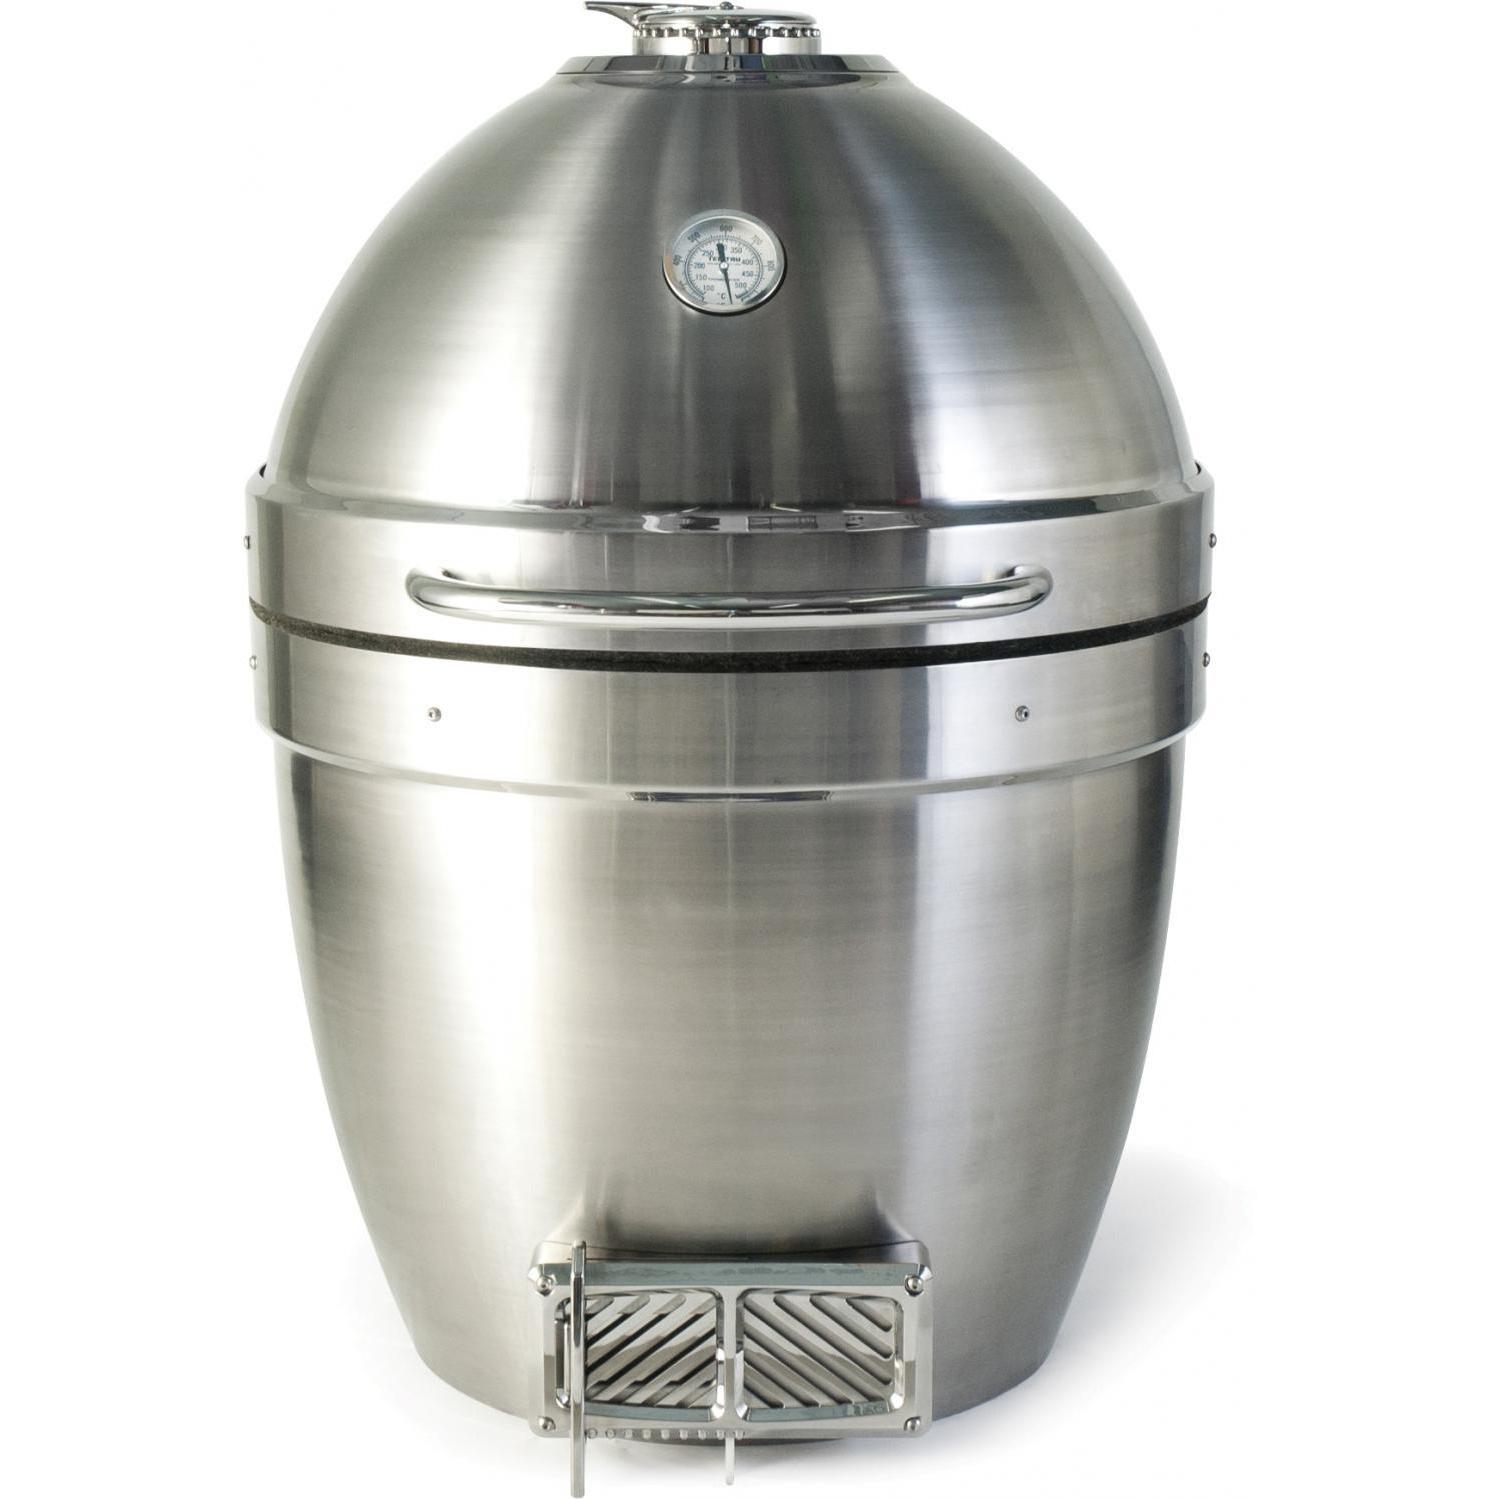 Kamado Joe ProJoe Stainless Steel Kamado Grill, Discount ID PJ28SS